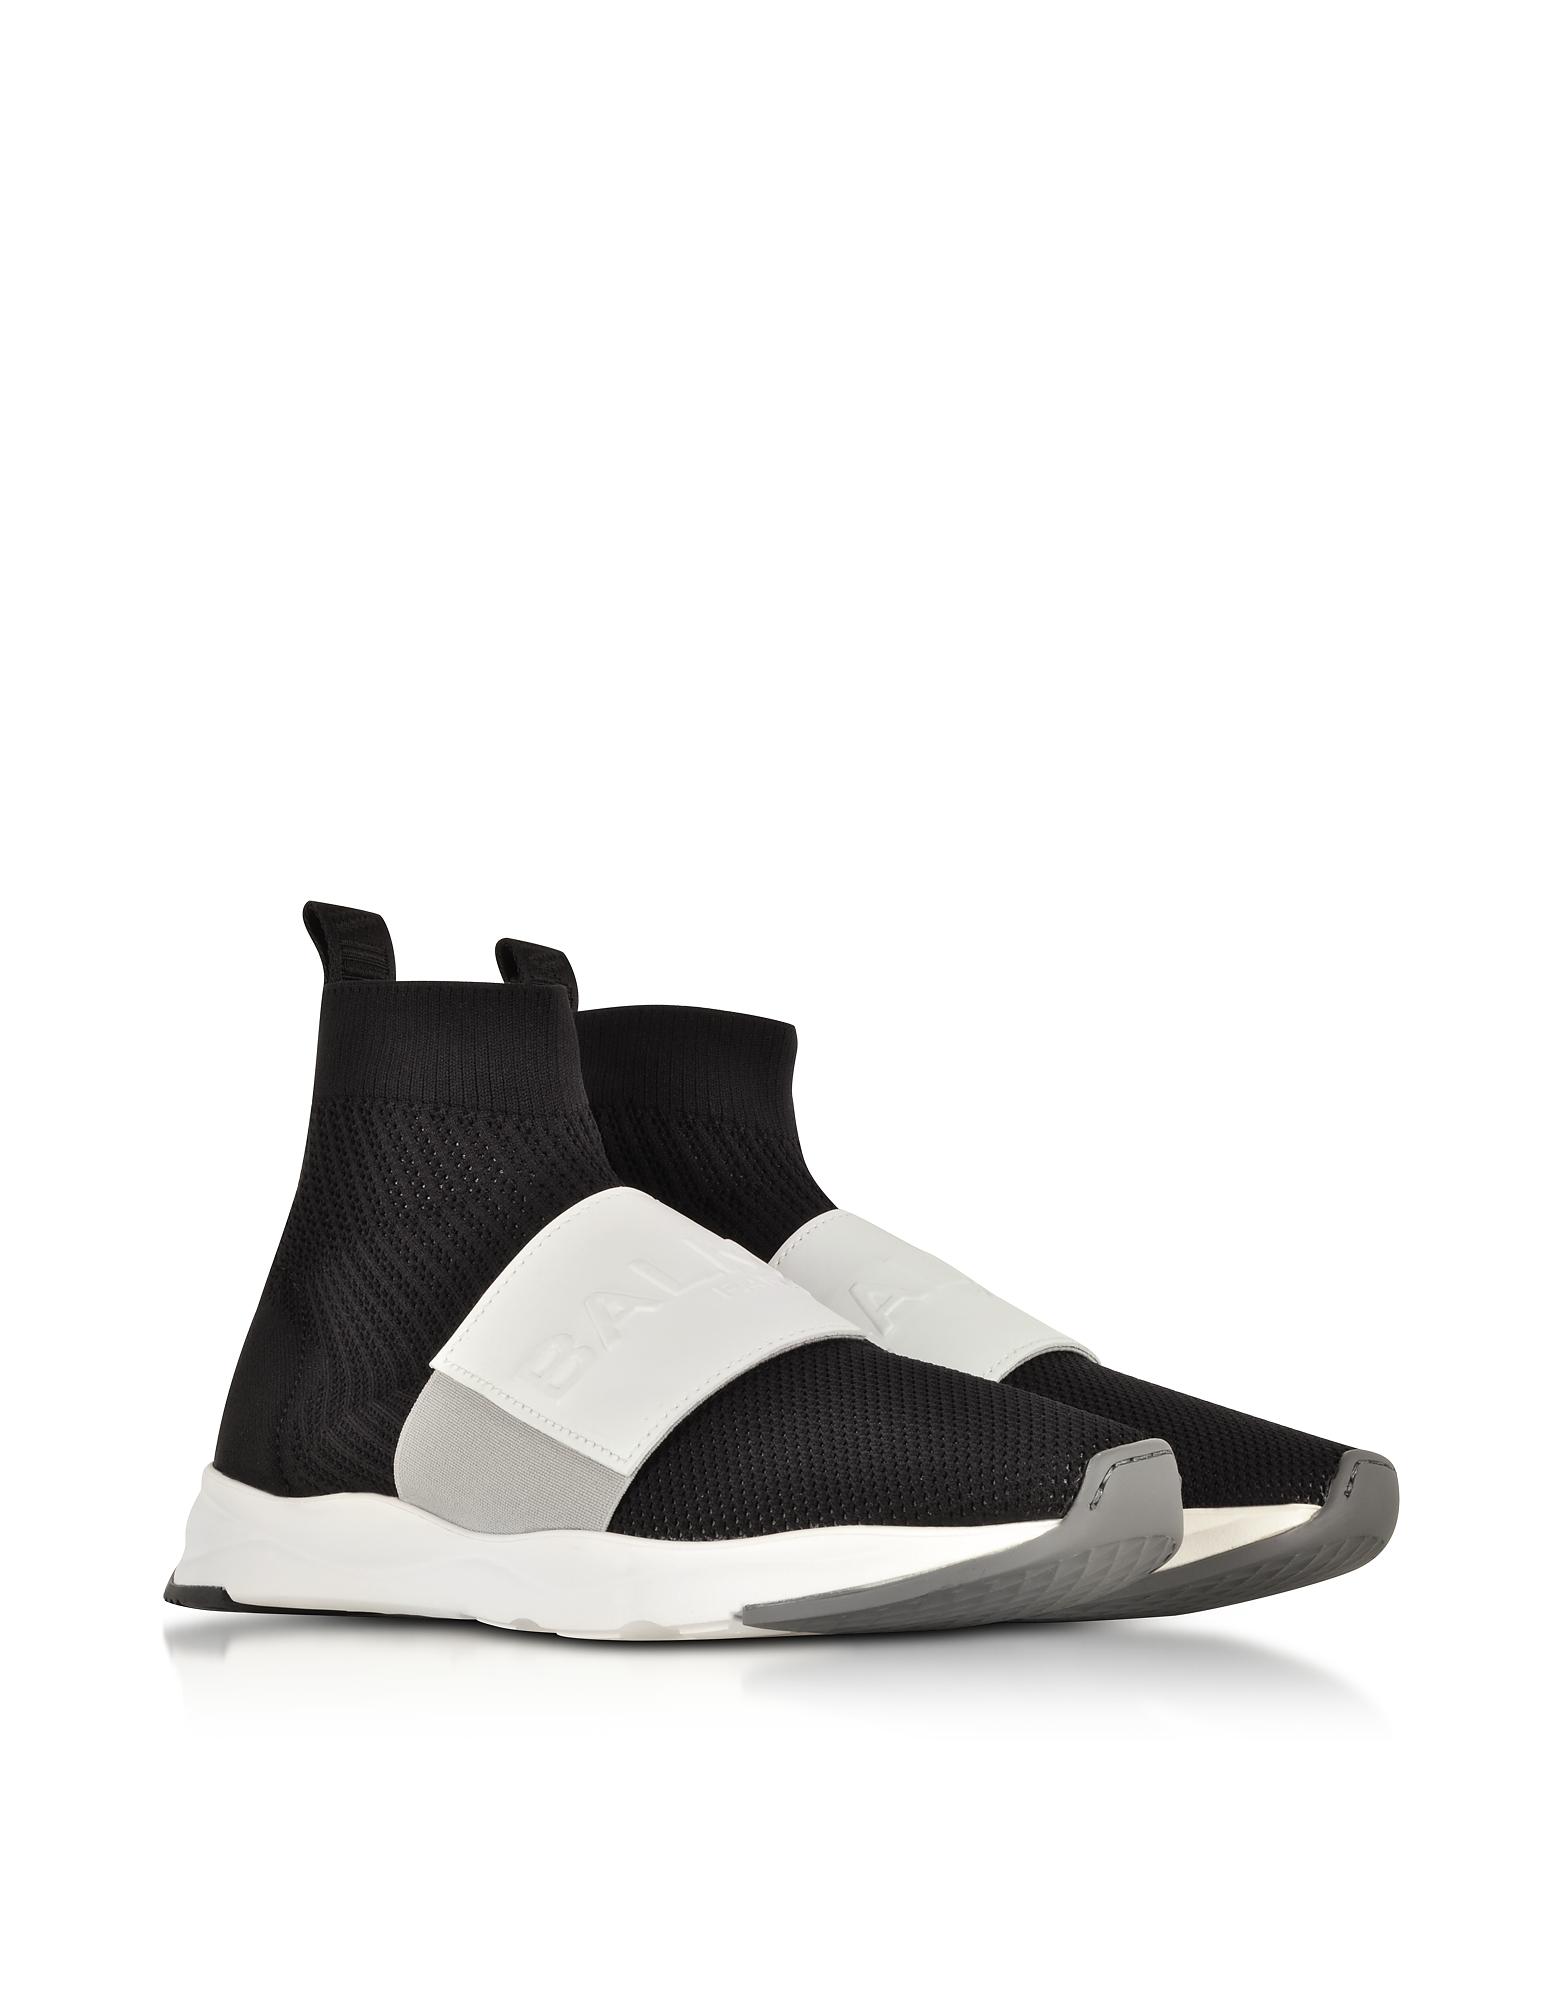 Balmain Shoes, Black & White Nylon and Leather Cameron Running Men's Snekers